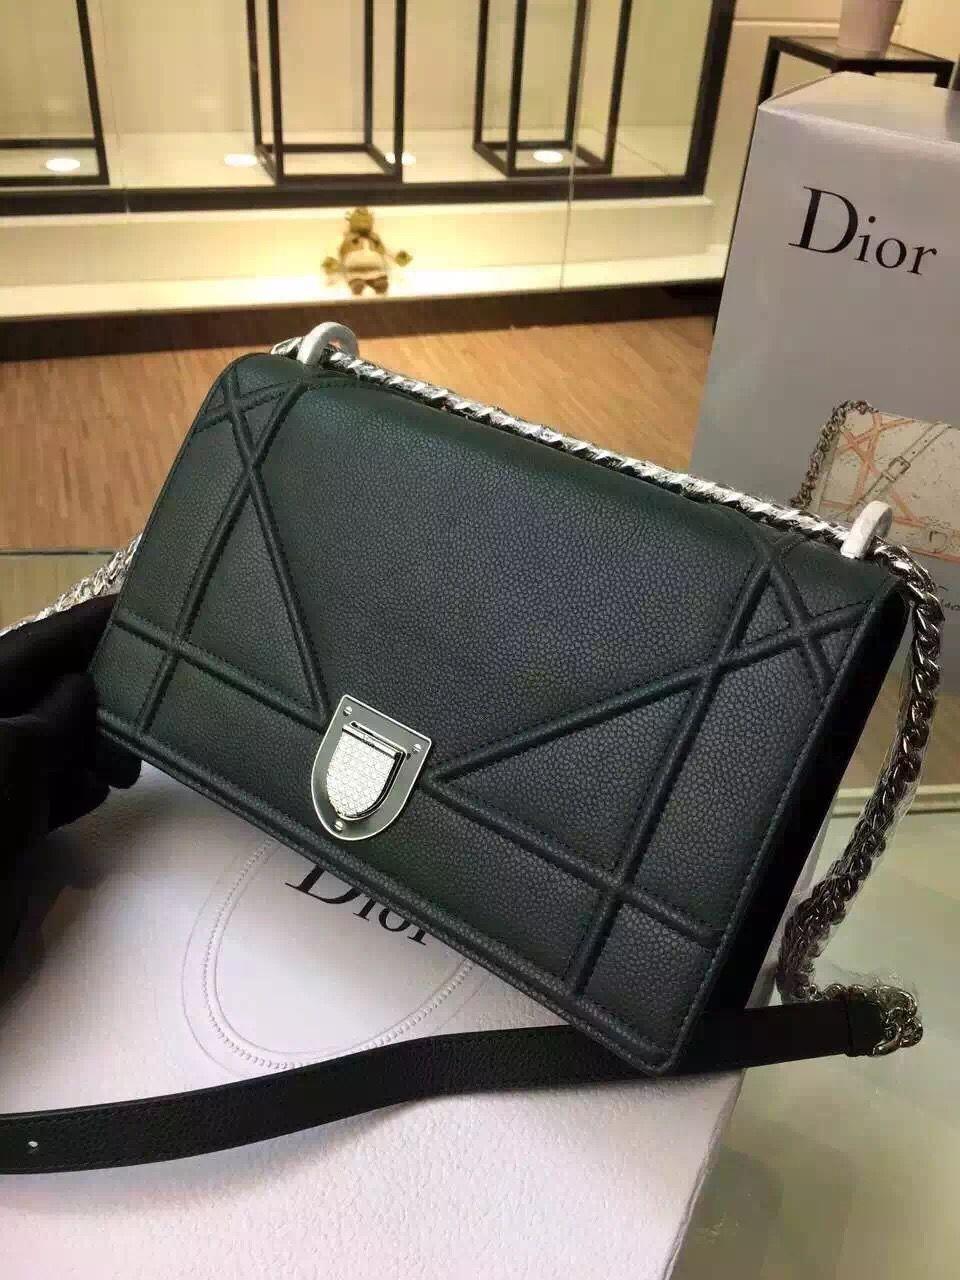 Dior Small Medium Diorama Grained Calfskin Flap Bag in Dark Green  Fall Winter 2015 cba9e0301c0bd